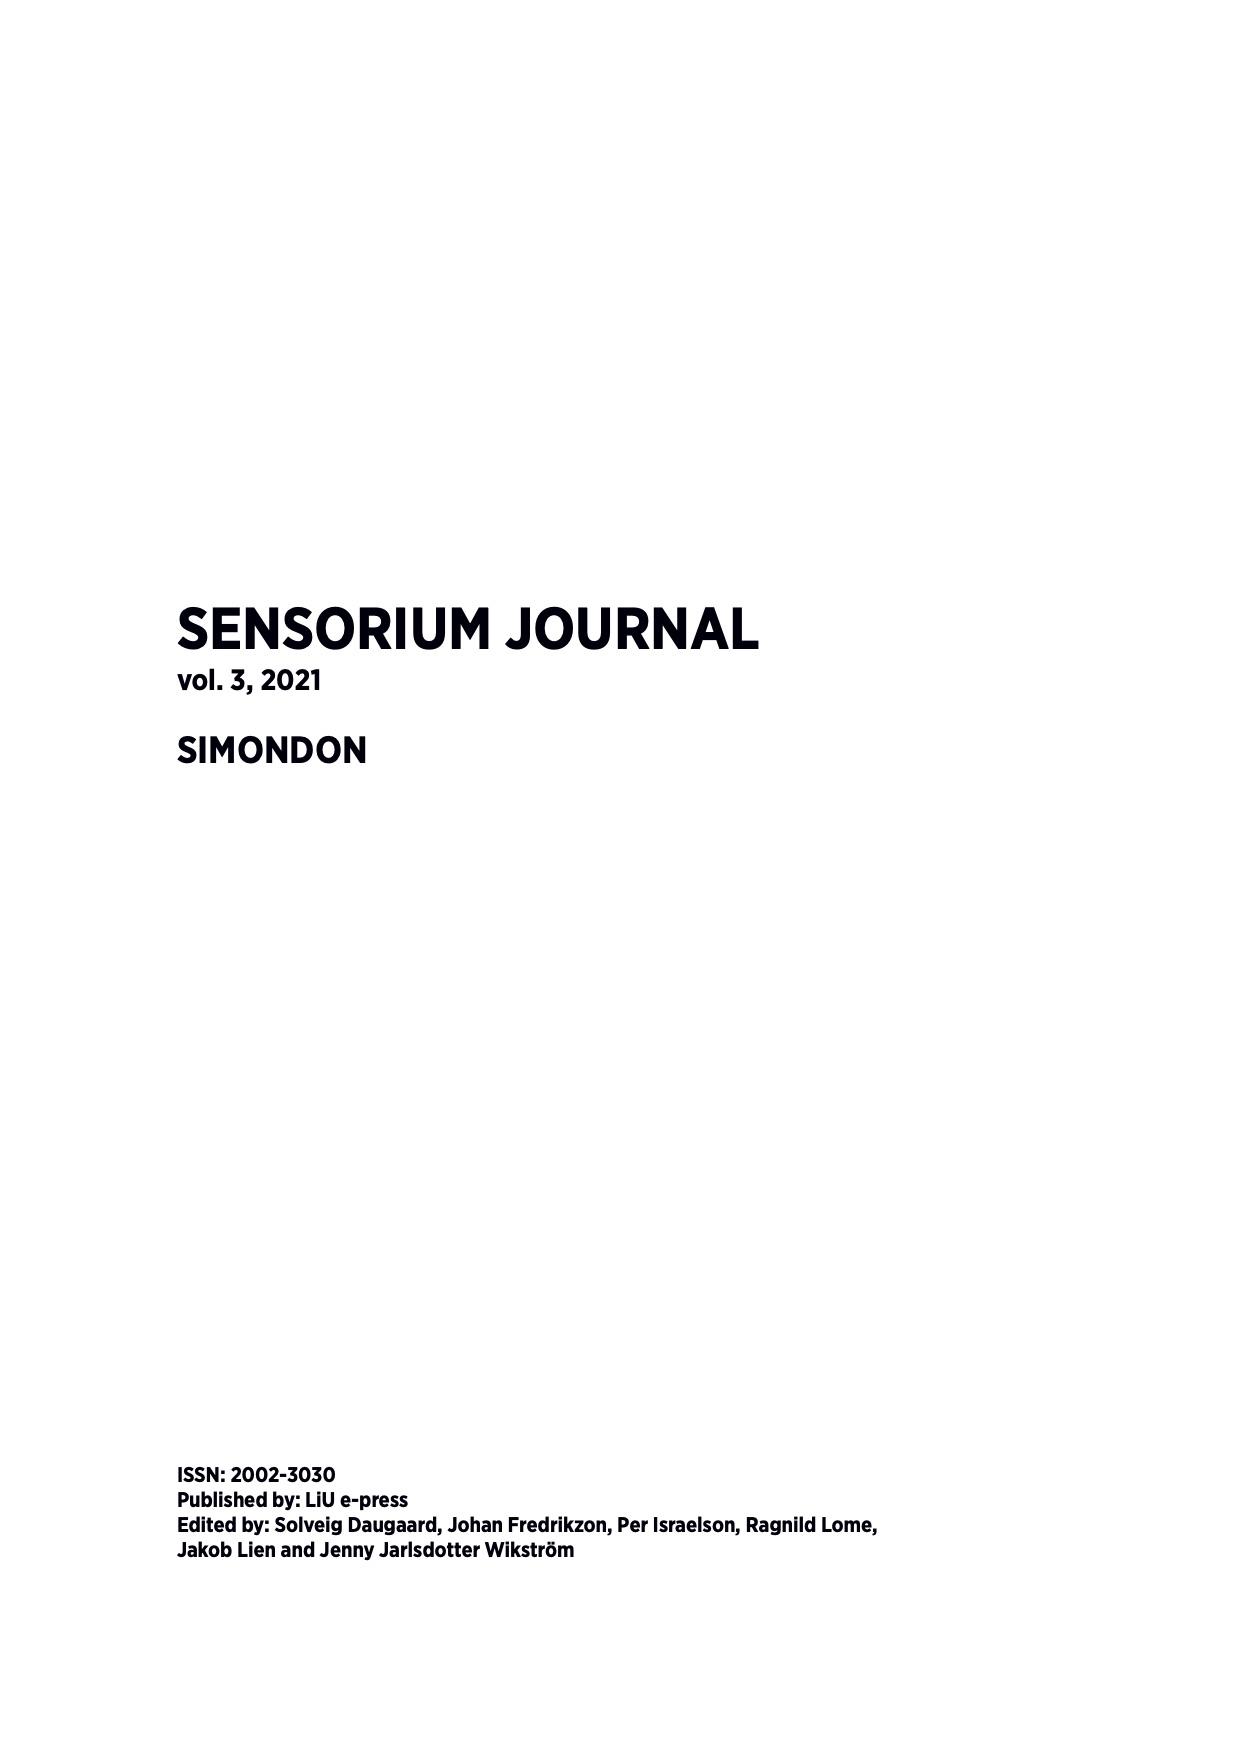 View Vol. 3 (2021): Sensorium Journal: Simondon